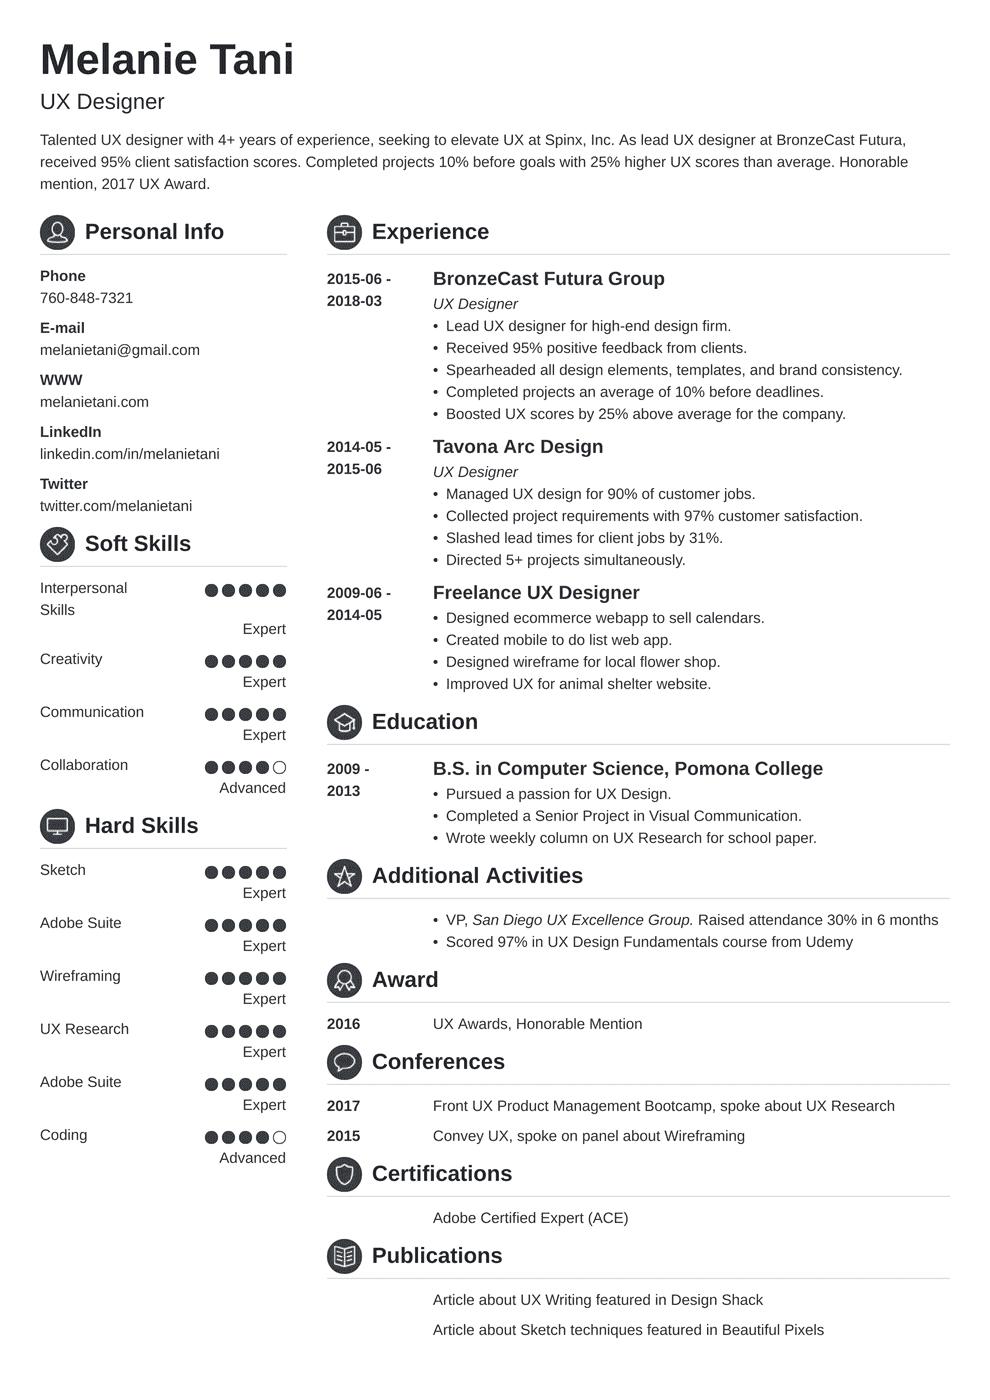 ux designer resume template crisp in 2020 Job resume